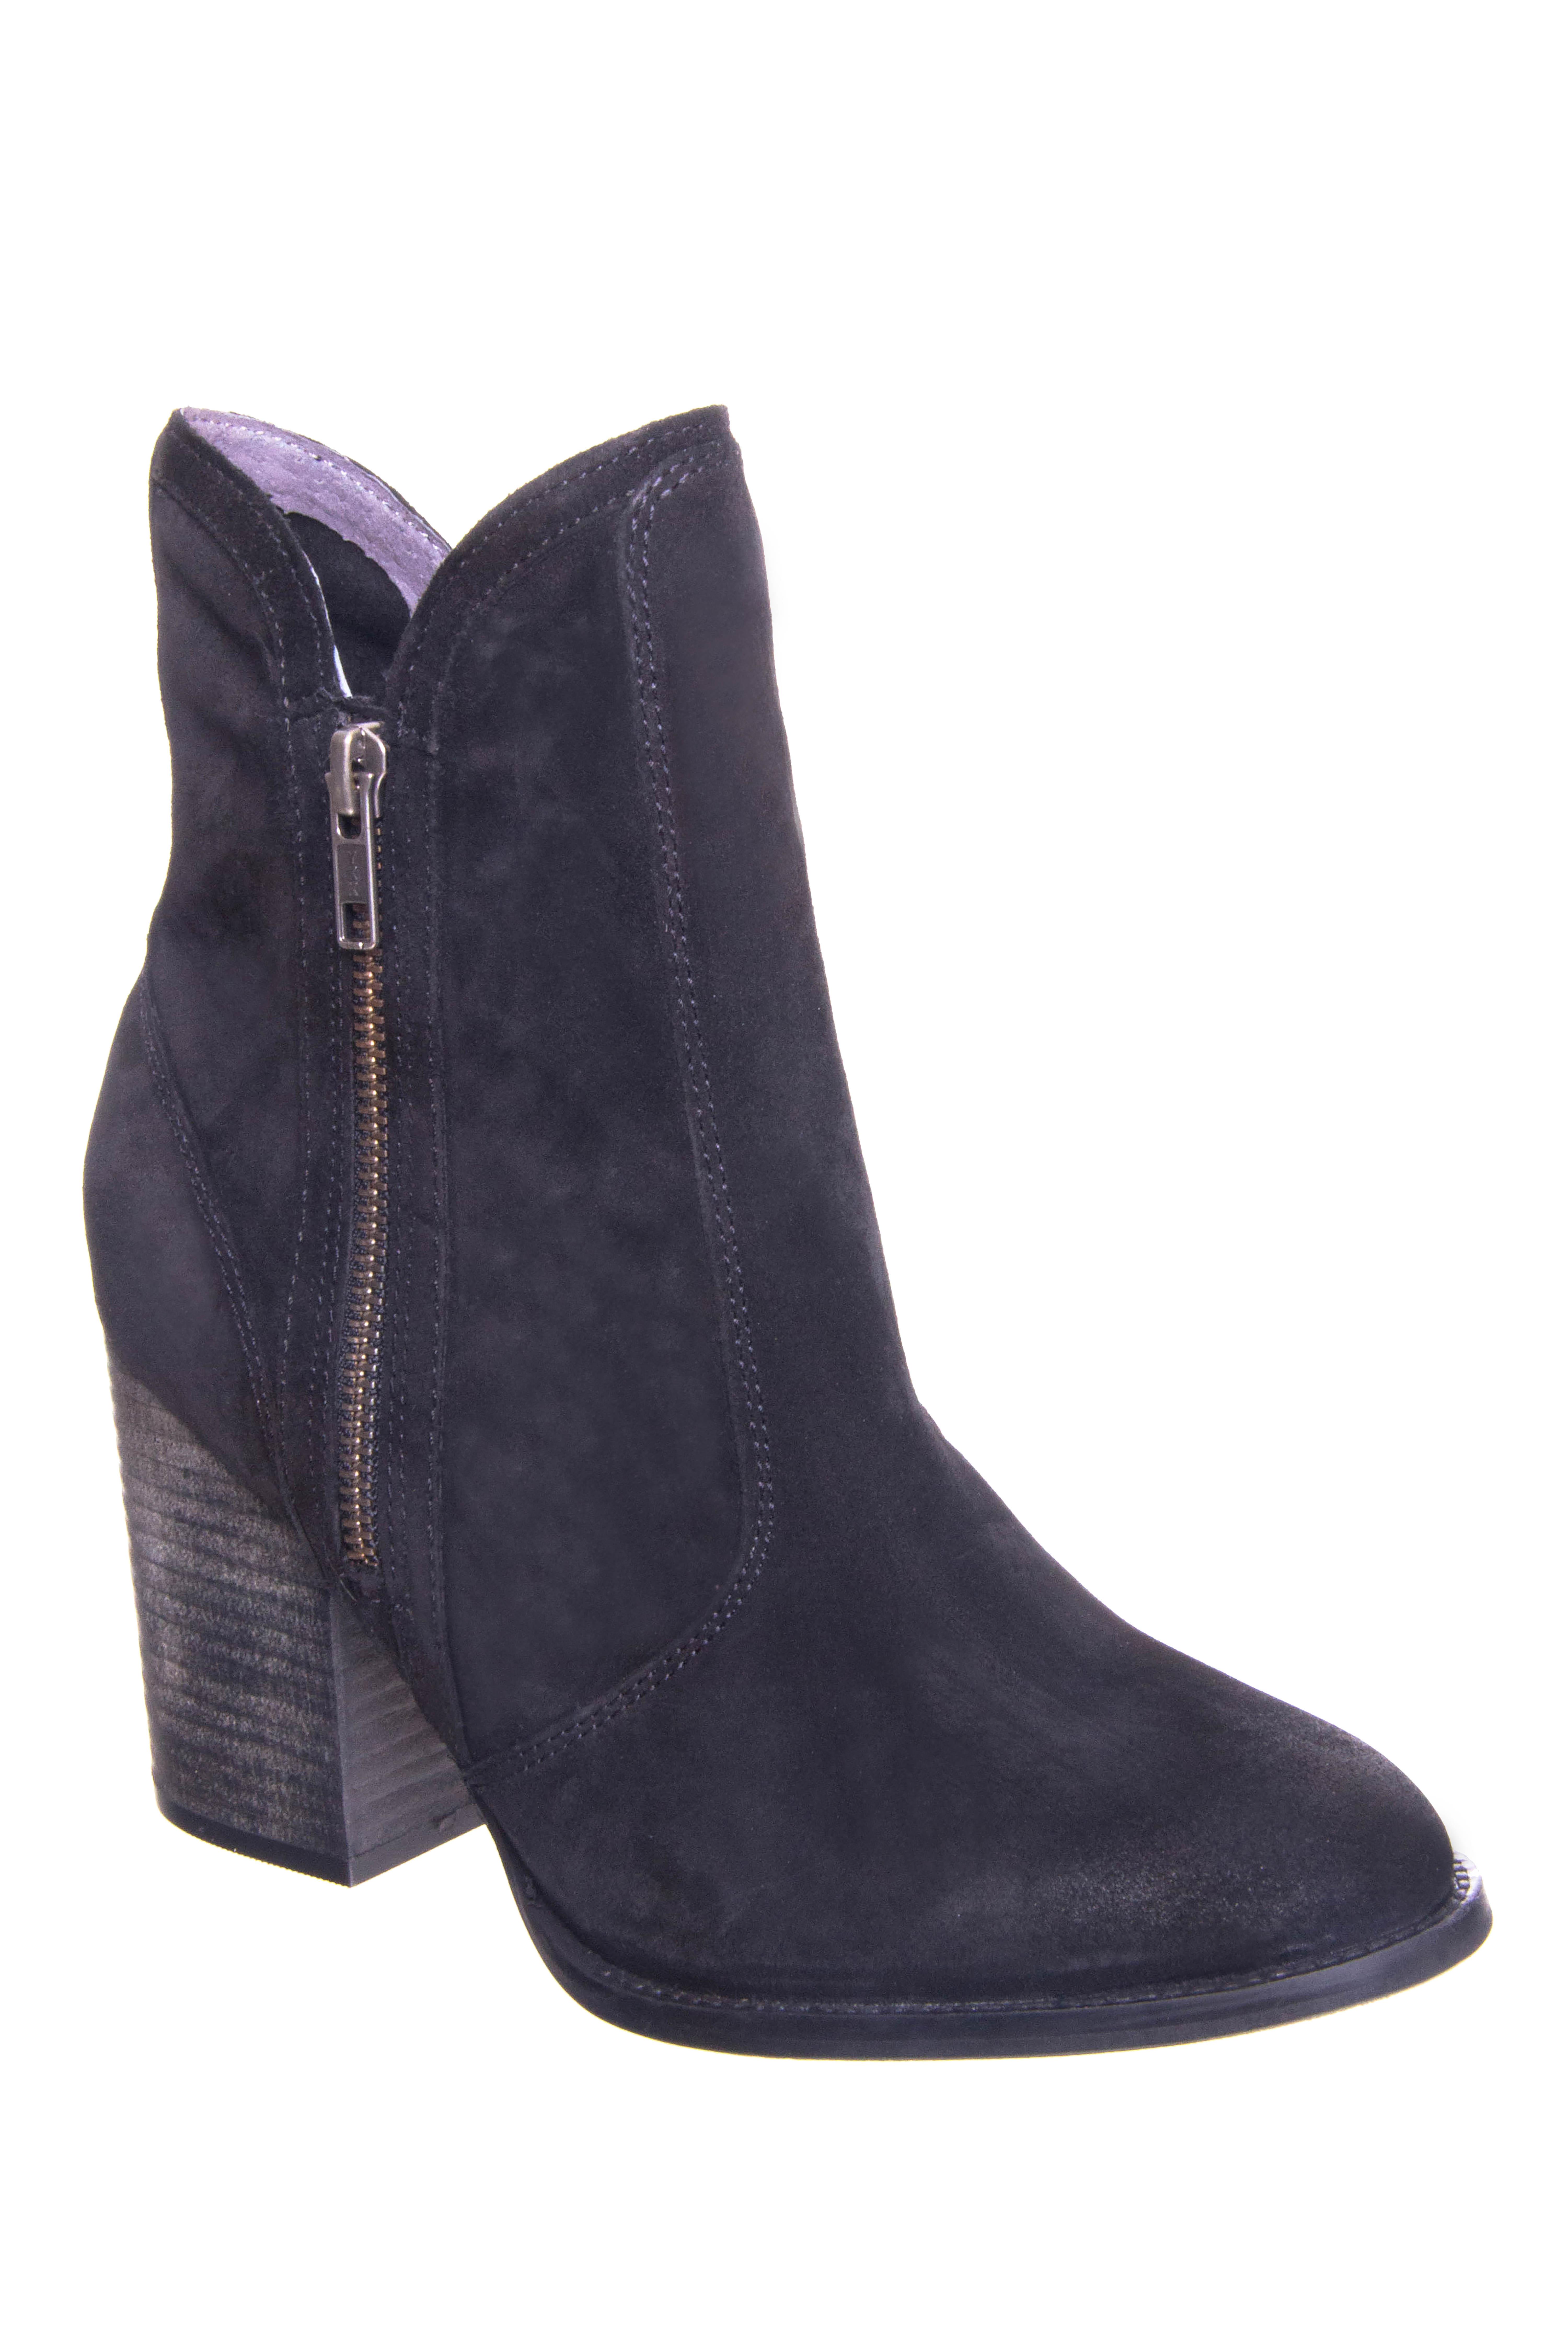 Seychelles Lori Penny High Heel Boots - Black